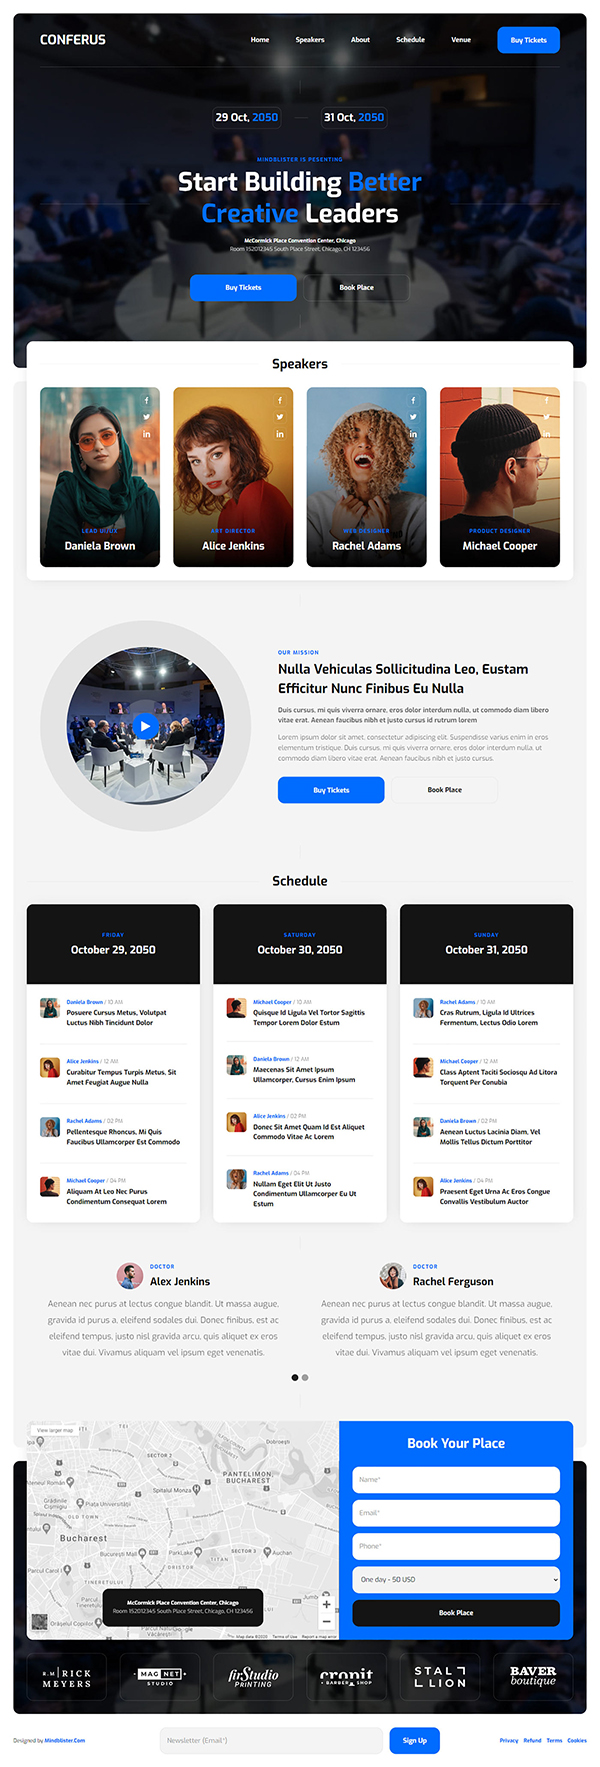 Conferus - Free Event Website Template